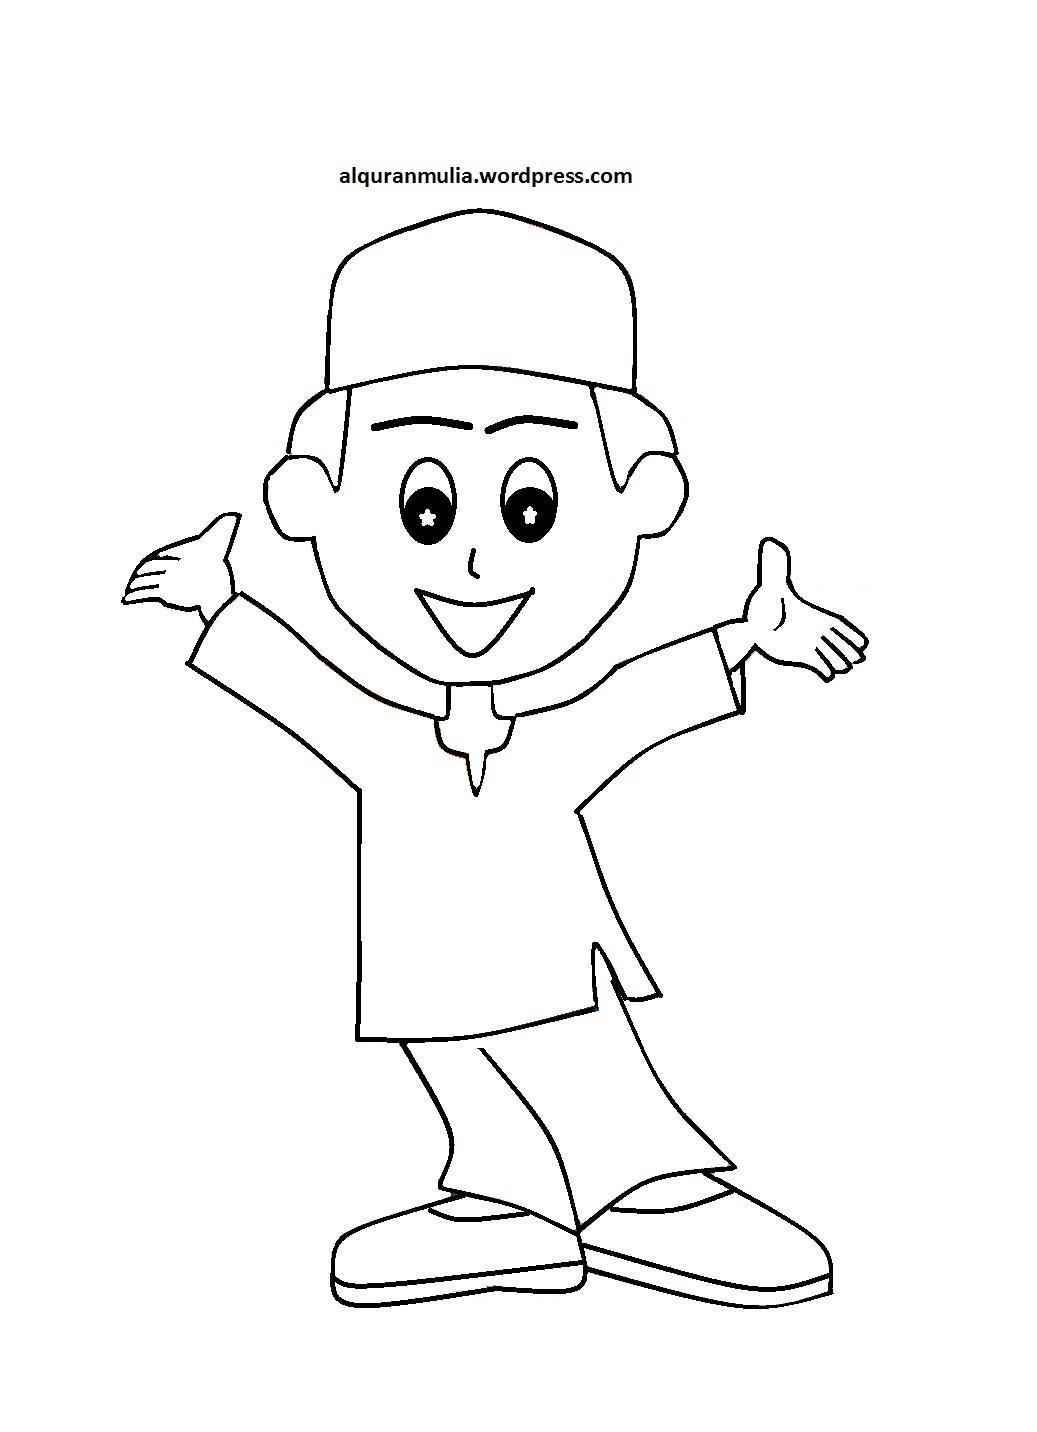 Mewarnai gambar kartun anak muslim 11